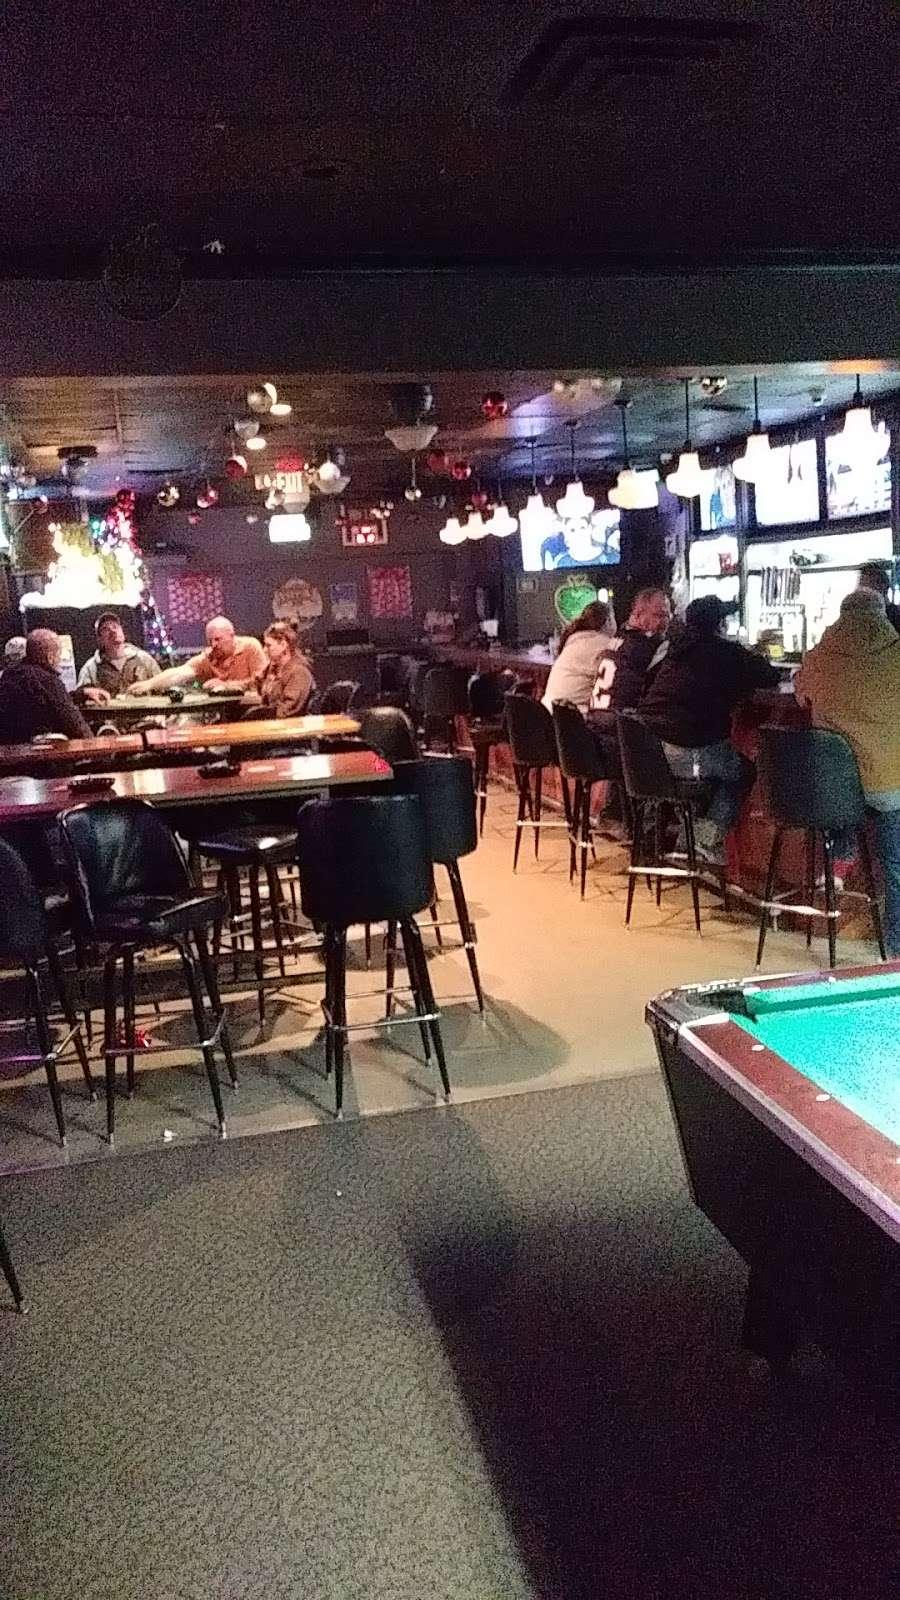 K Cs Neighborhood Bar & Grill - restaurant  | Photo 4 of 10 | Address: 10201 47th St, Shawnee, KS 66203, USA | Phone: (913) 262-7211